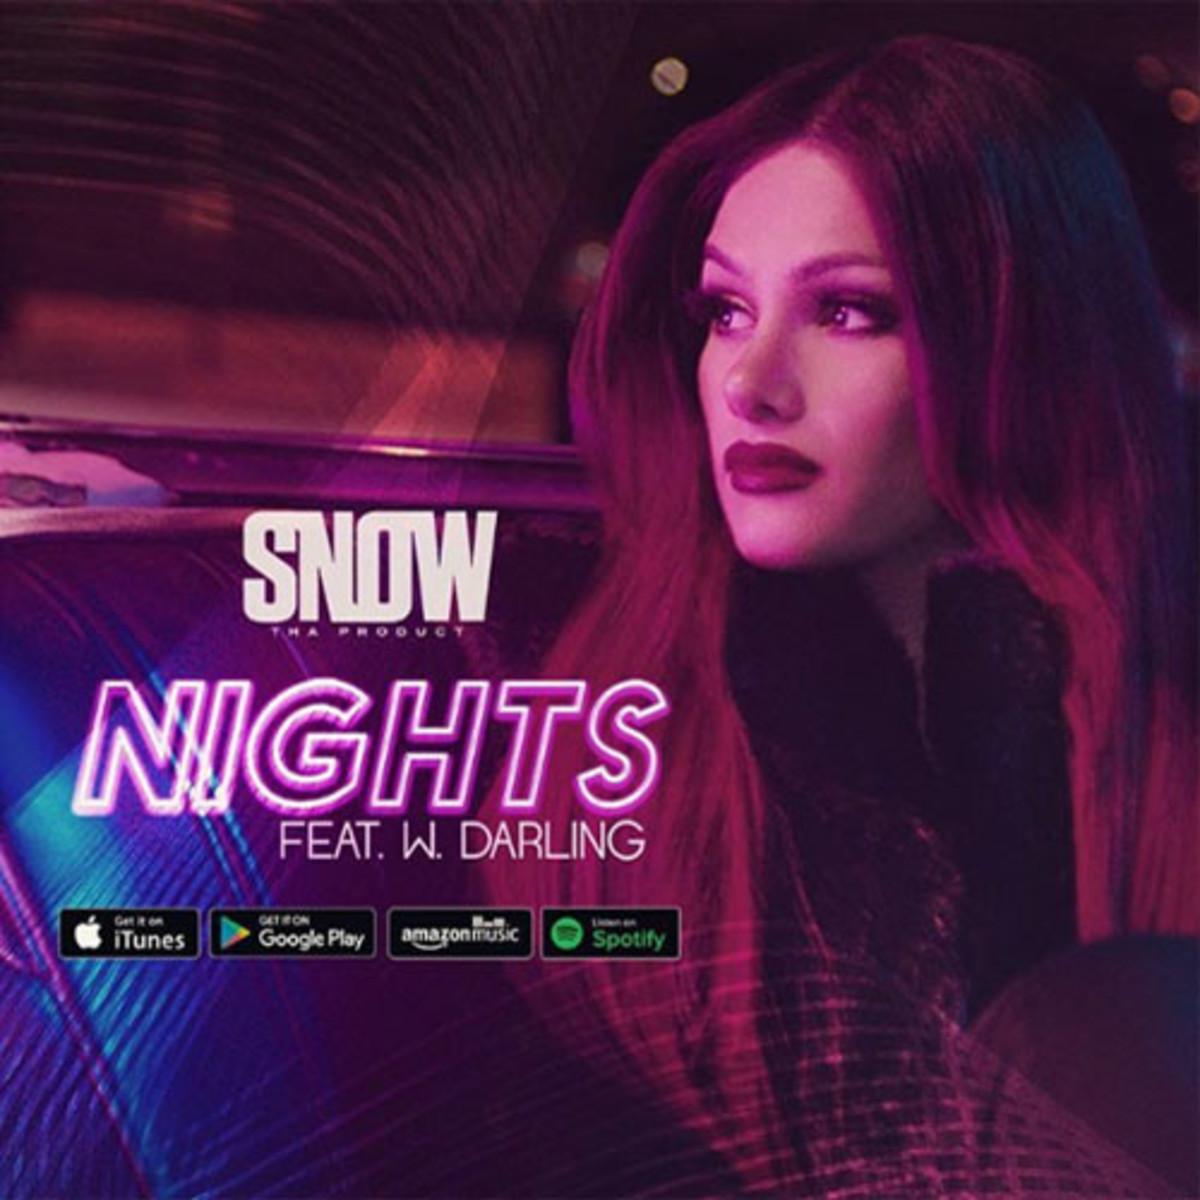 snow-tha-product-nights.jpg